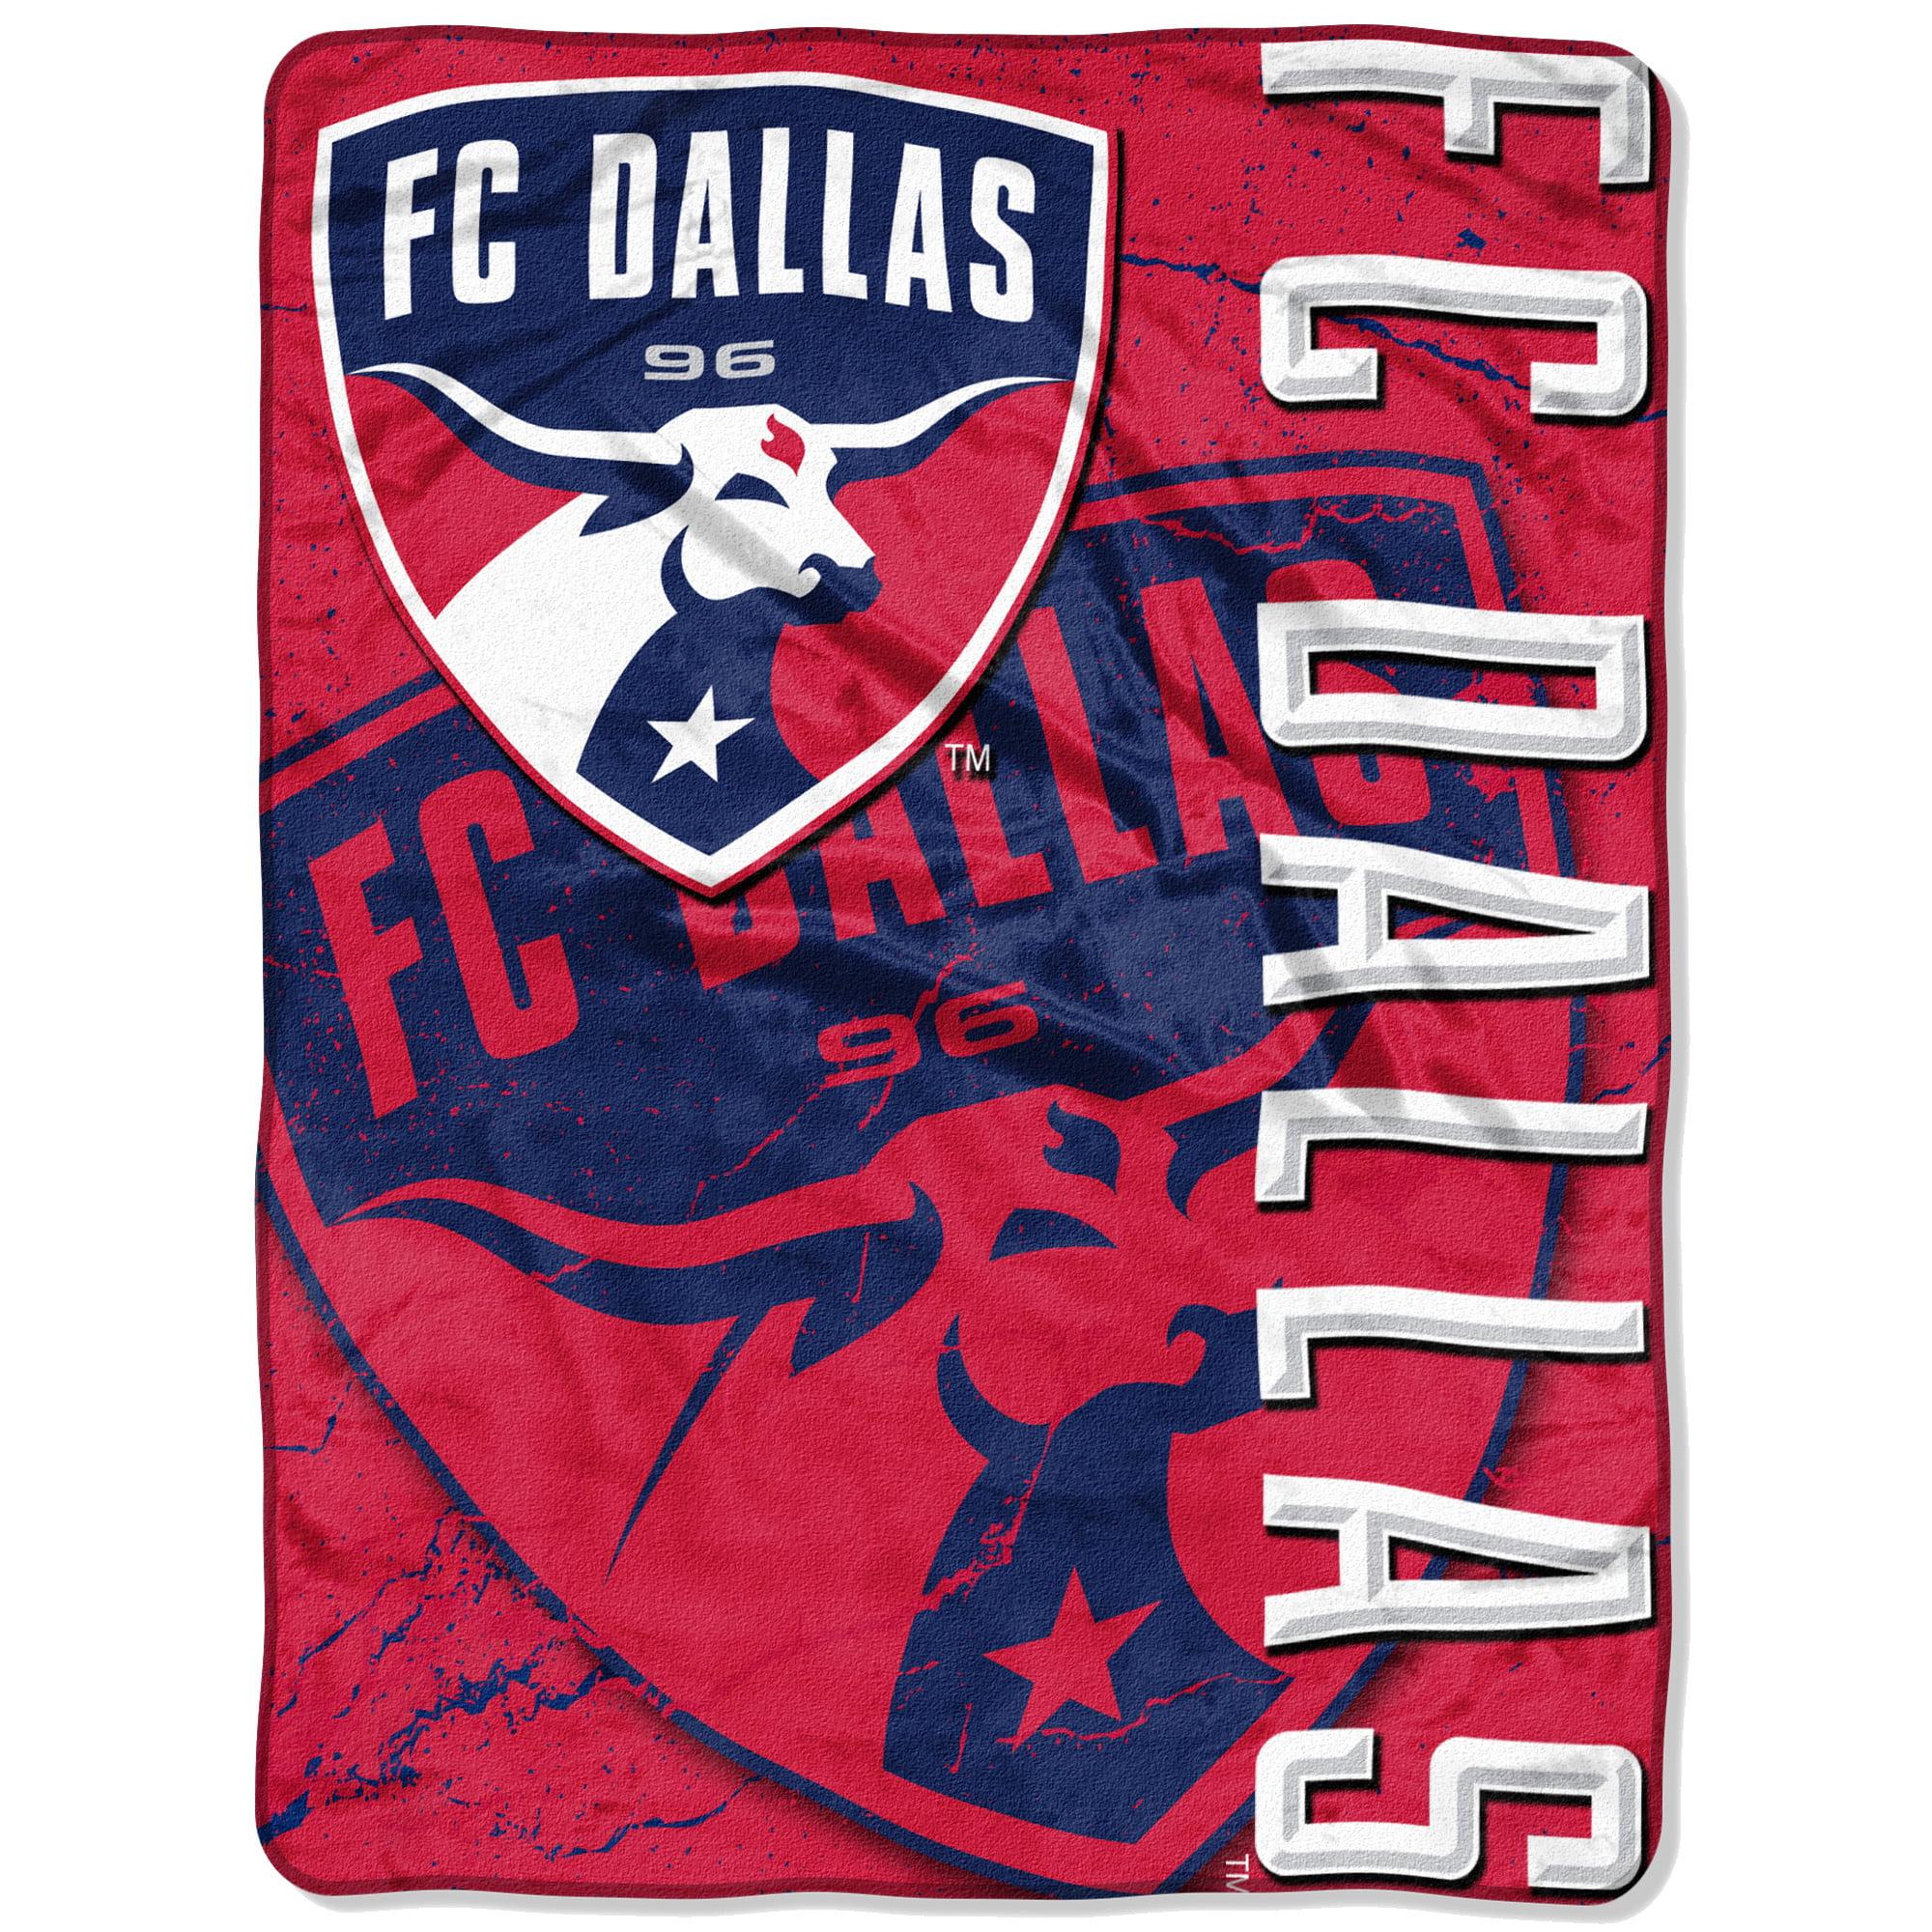 "FC Dallas The Northwest Company 46"" x 60"" Concrete Raschel Throw Blanket - Red - No Size"